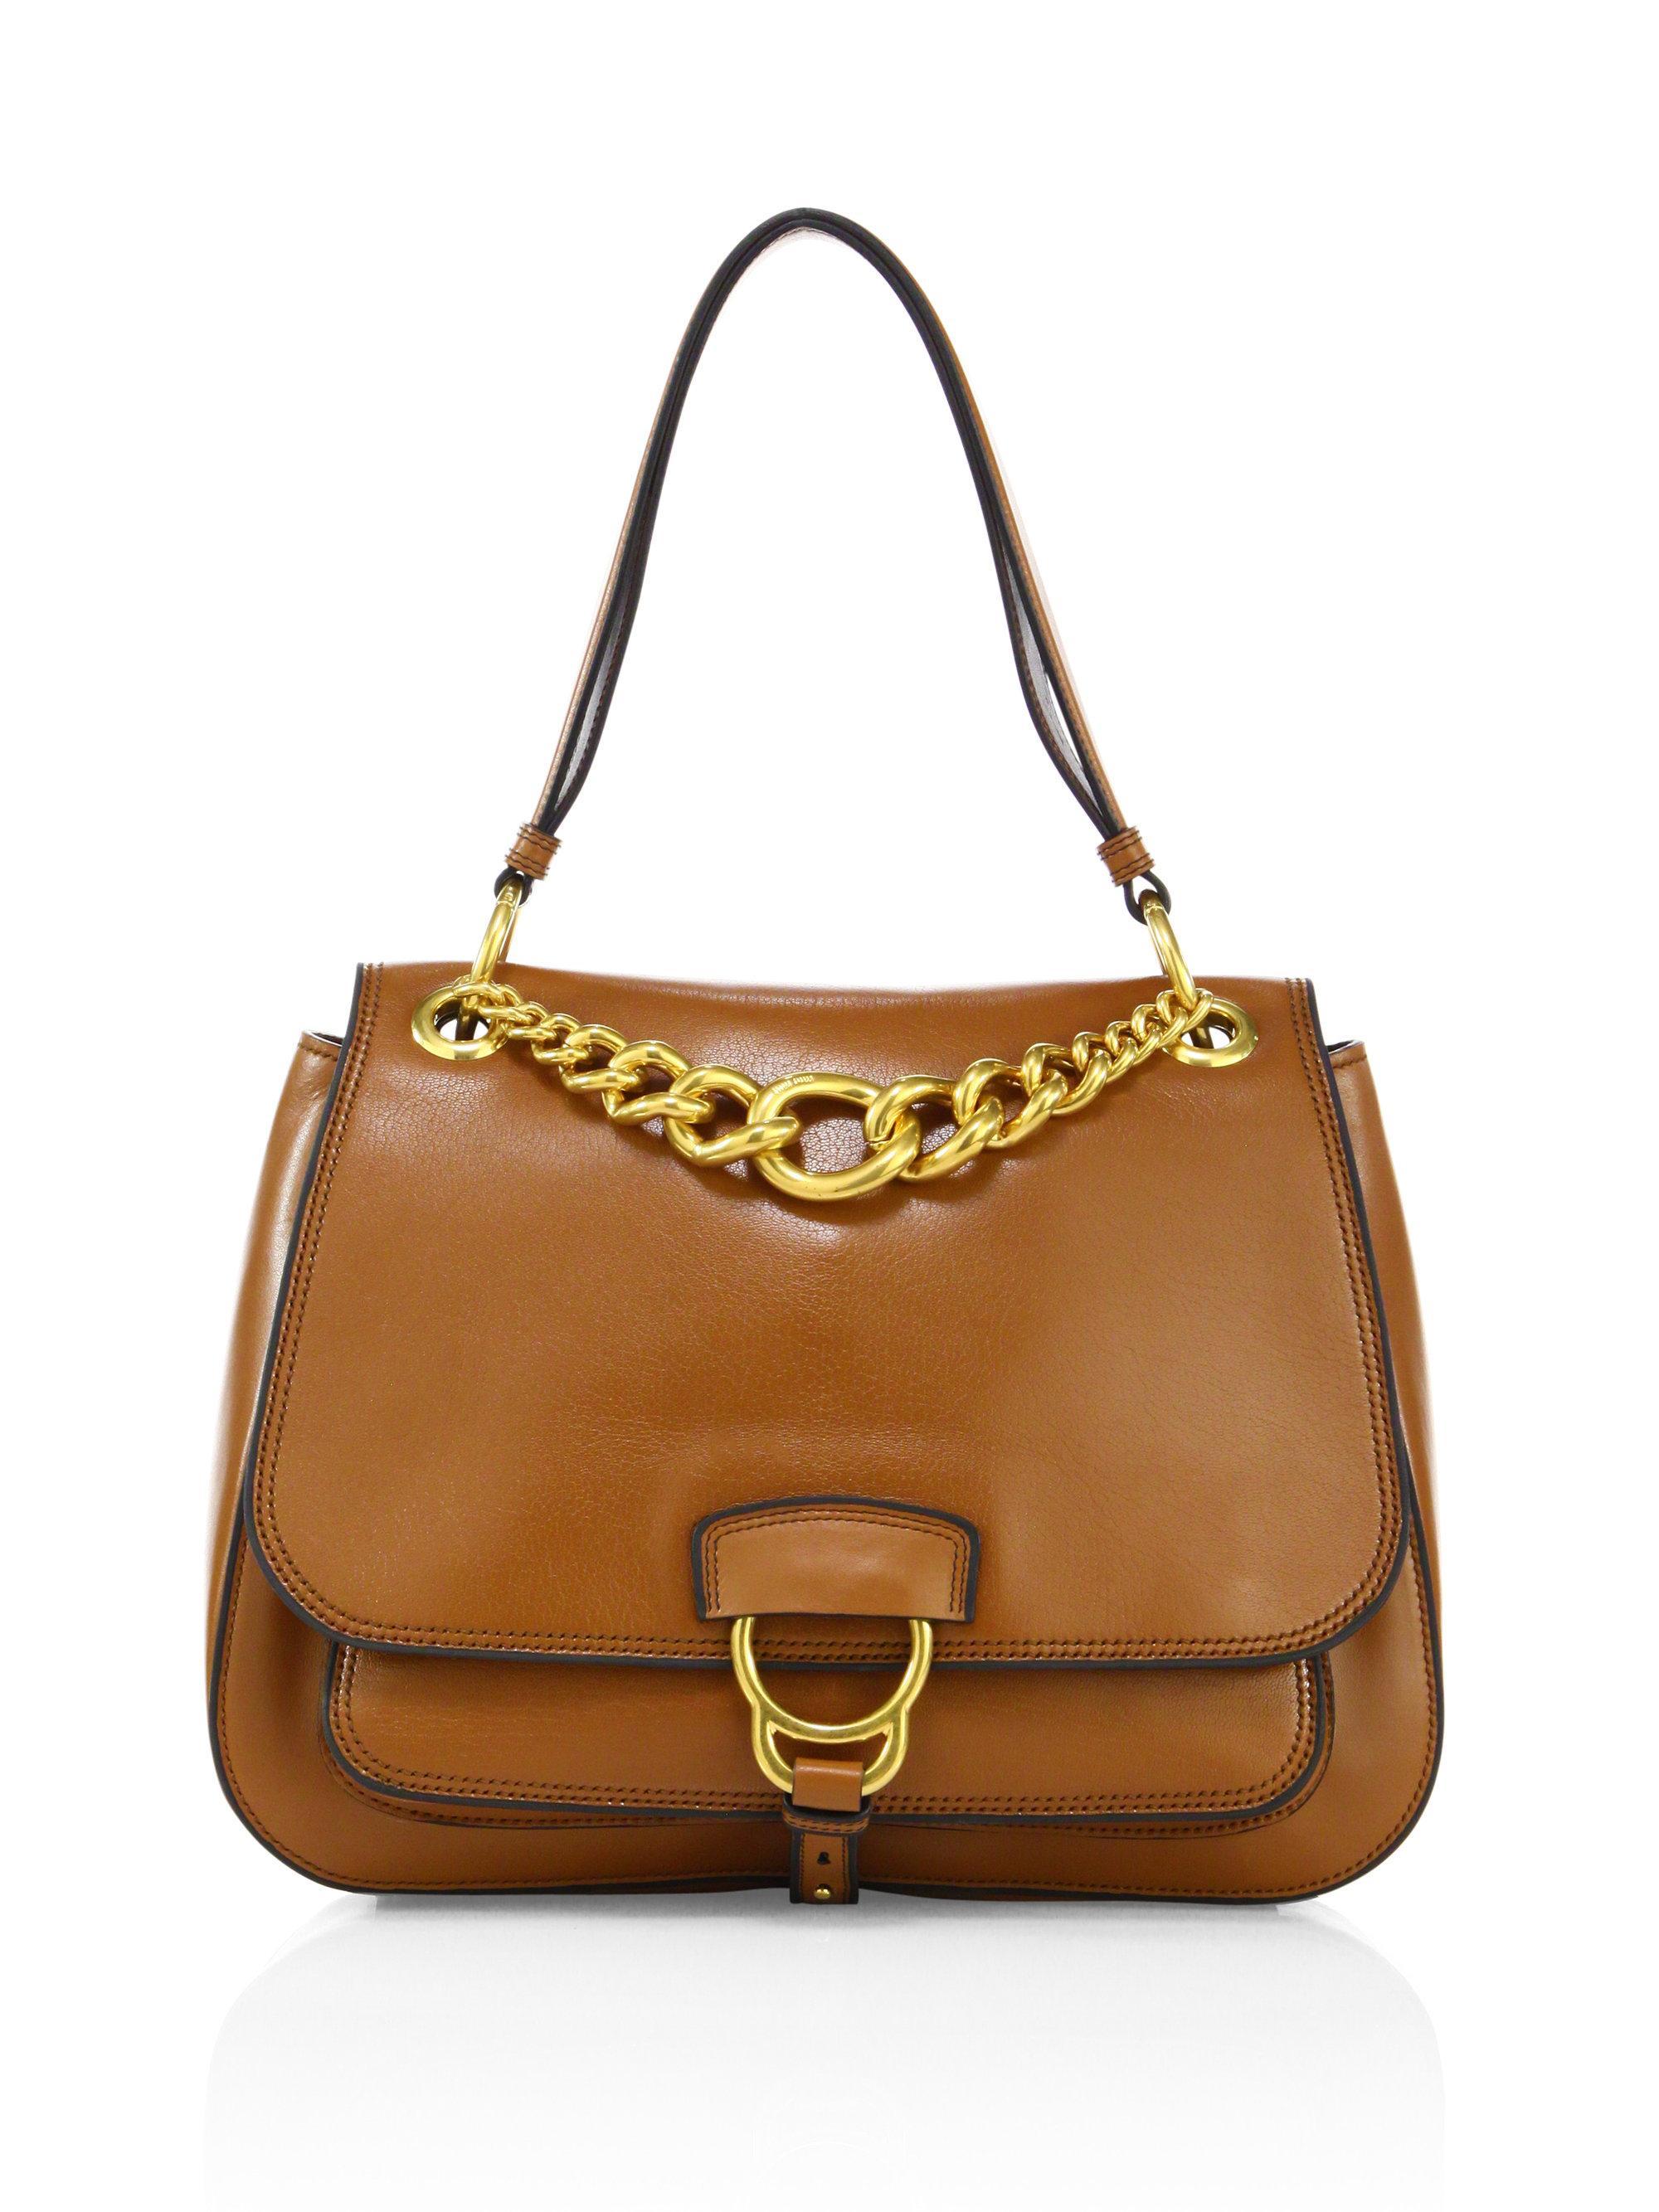 067a64933c7d Miu Miu Large Dahlia Madras Leather Saddle Bag in Brown - Lyst